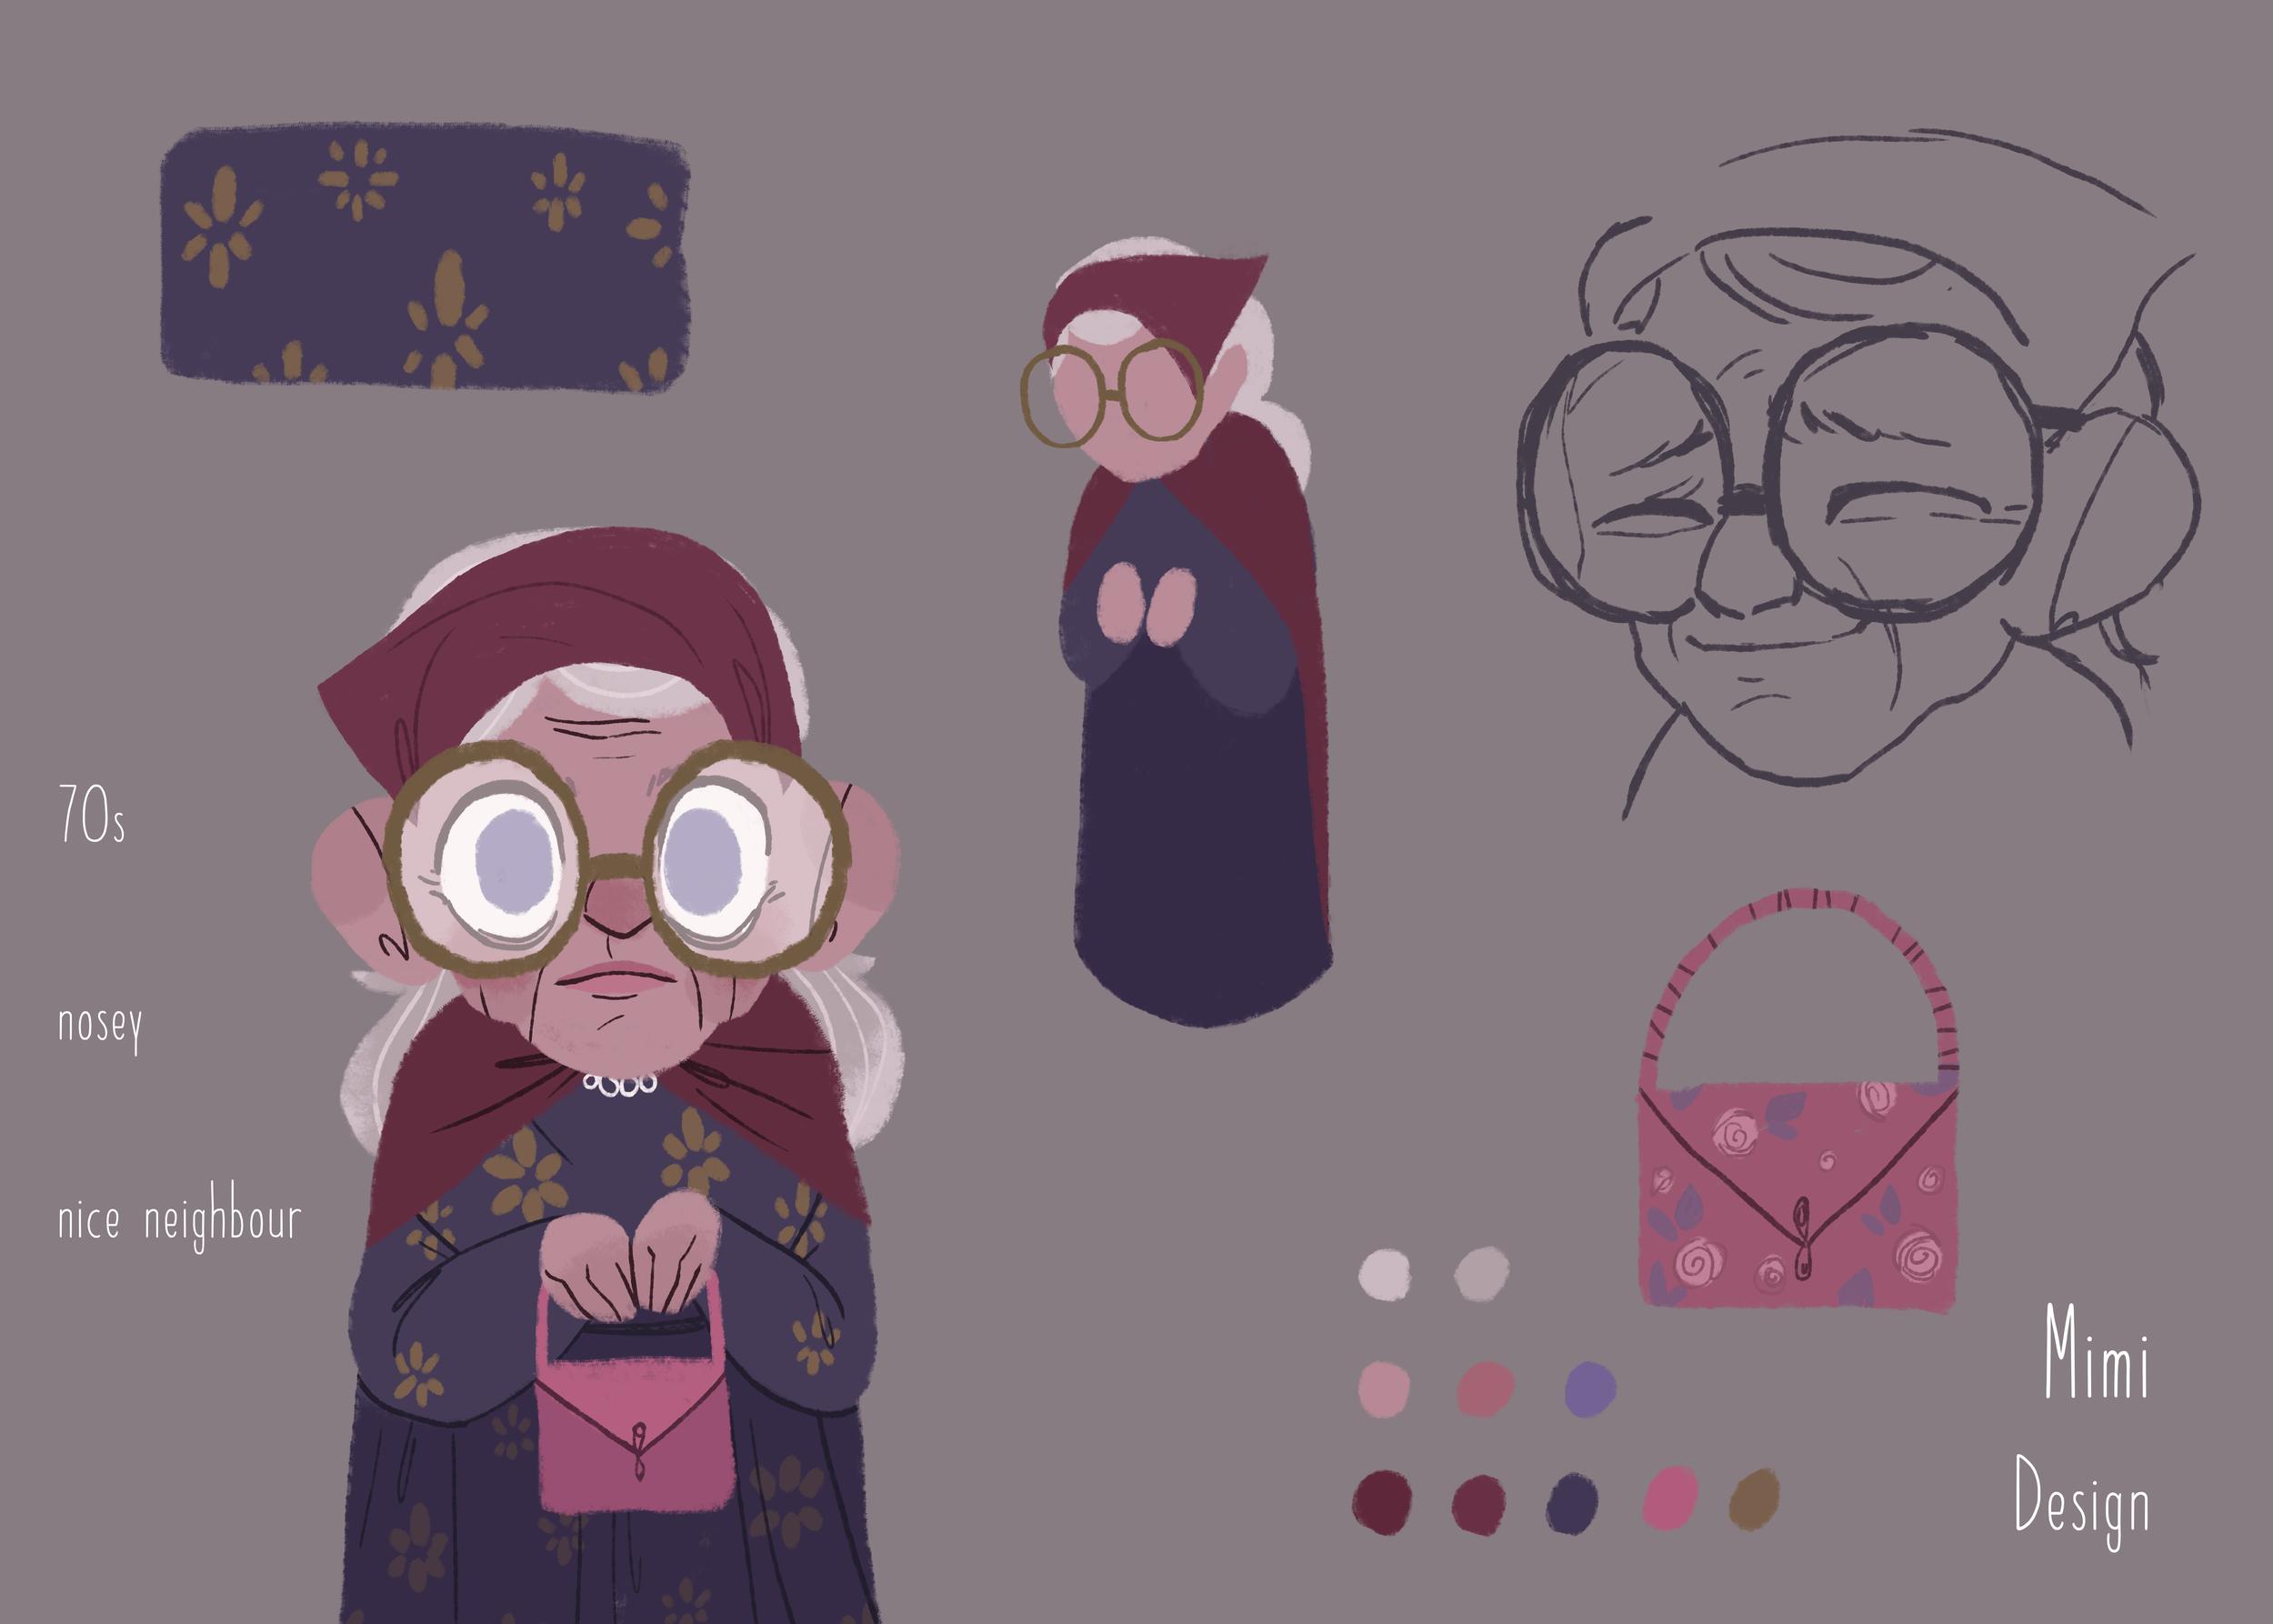 mimi_character_design.png